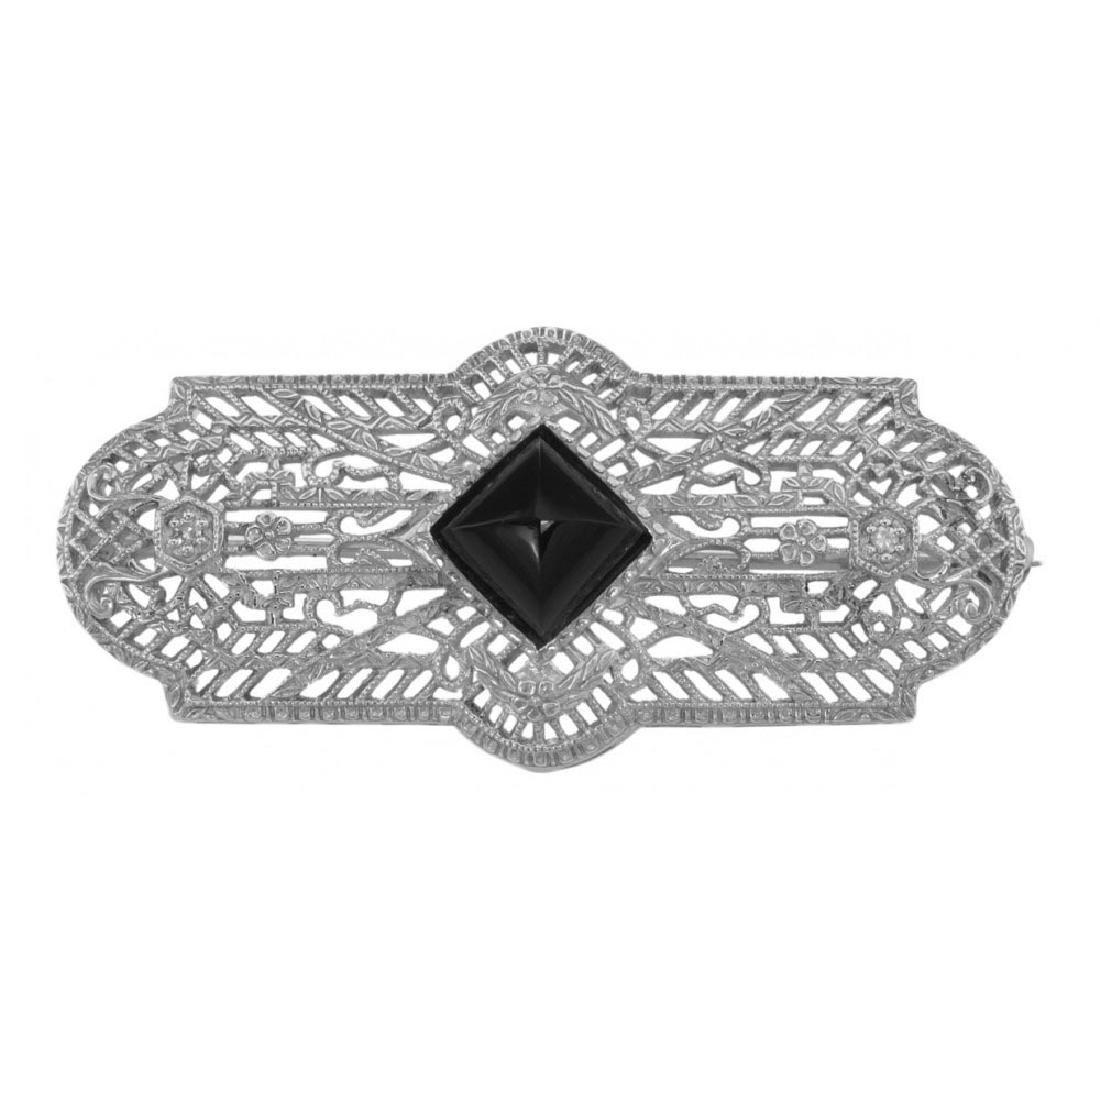 Art Deco Style Black Onyx and Diamond Pin / Brooch - St